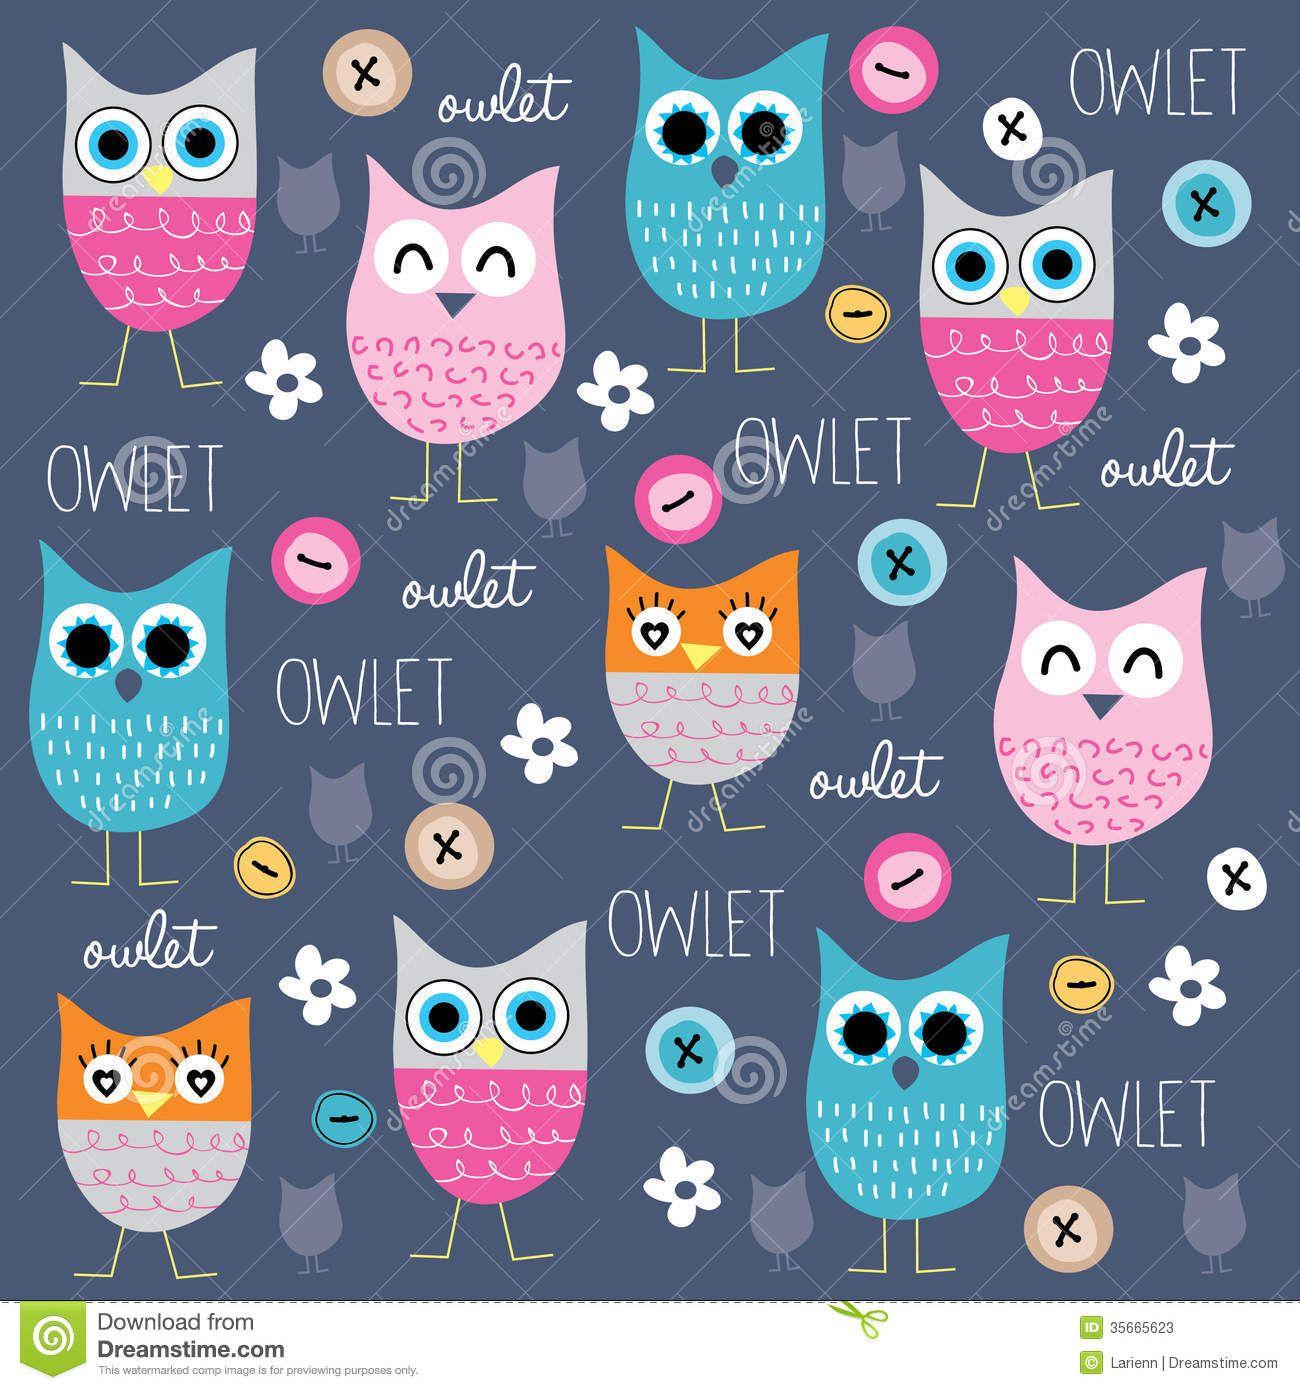 Cartoon owl desktop wallpaper k ultra hd cartoon owl wallpapers cartoon owl desktop wallpaper k ultra hd cartoon owl wallpapers voltagebd Gallery